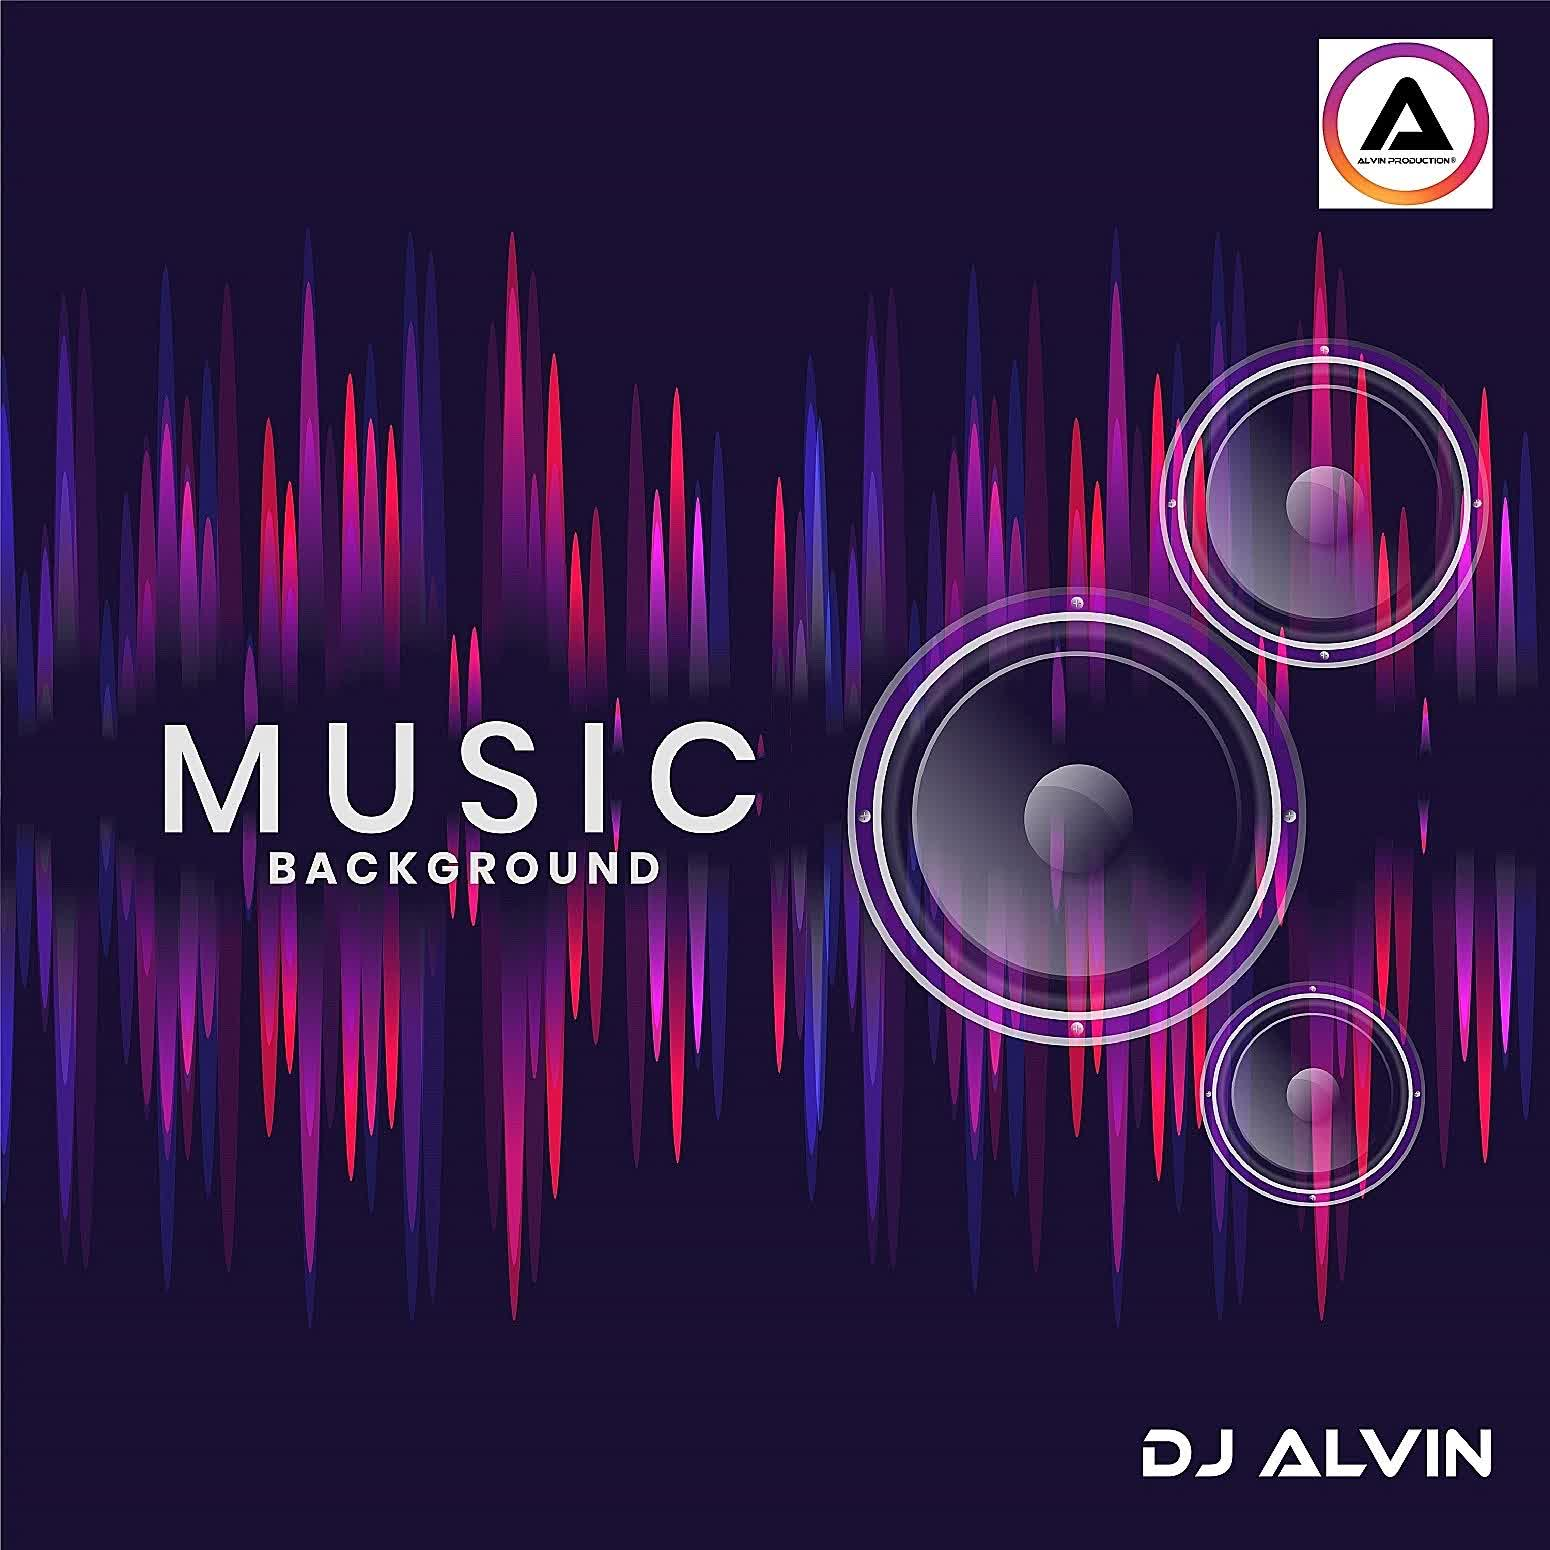 DJ Alvin - Music Background